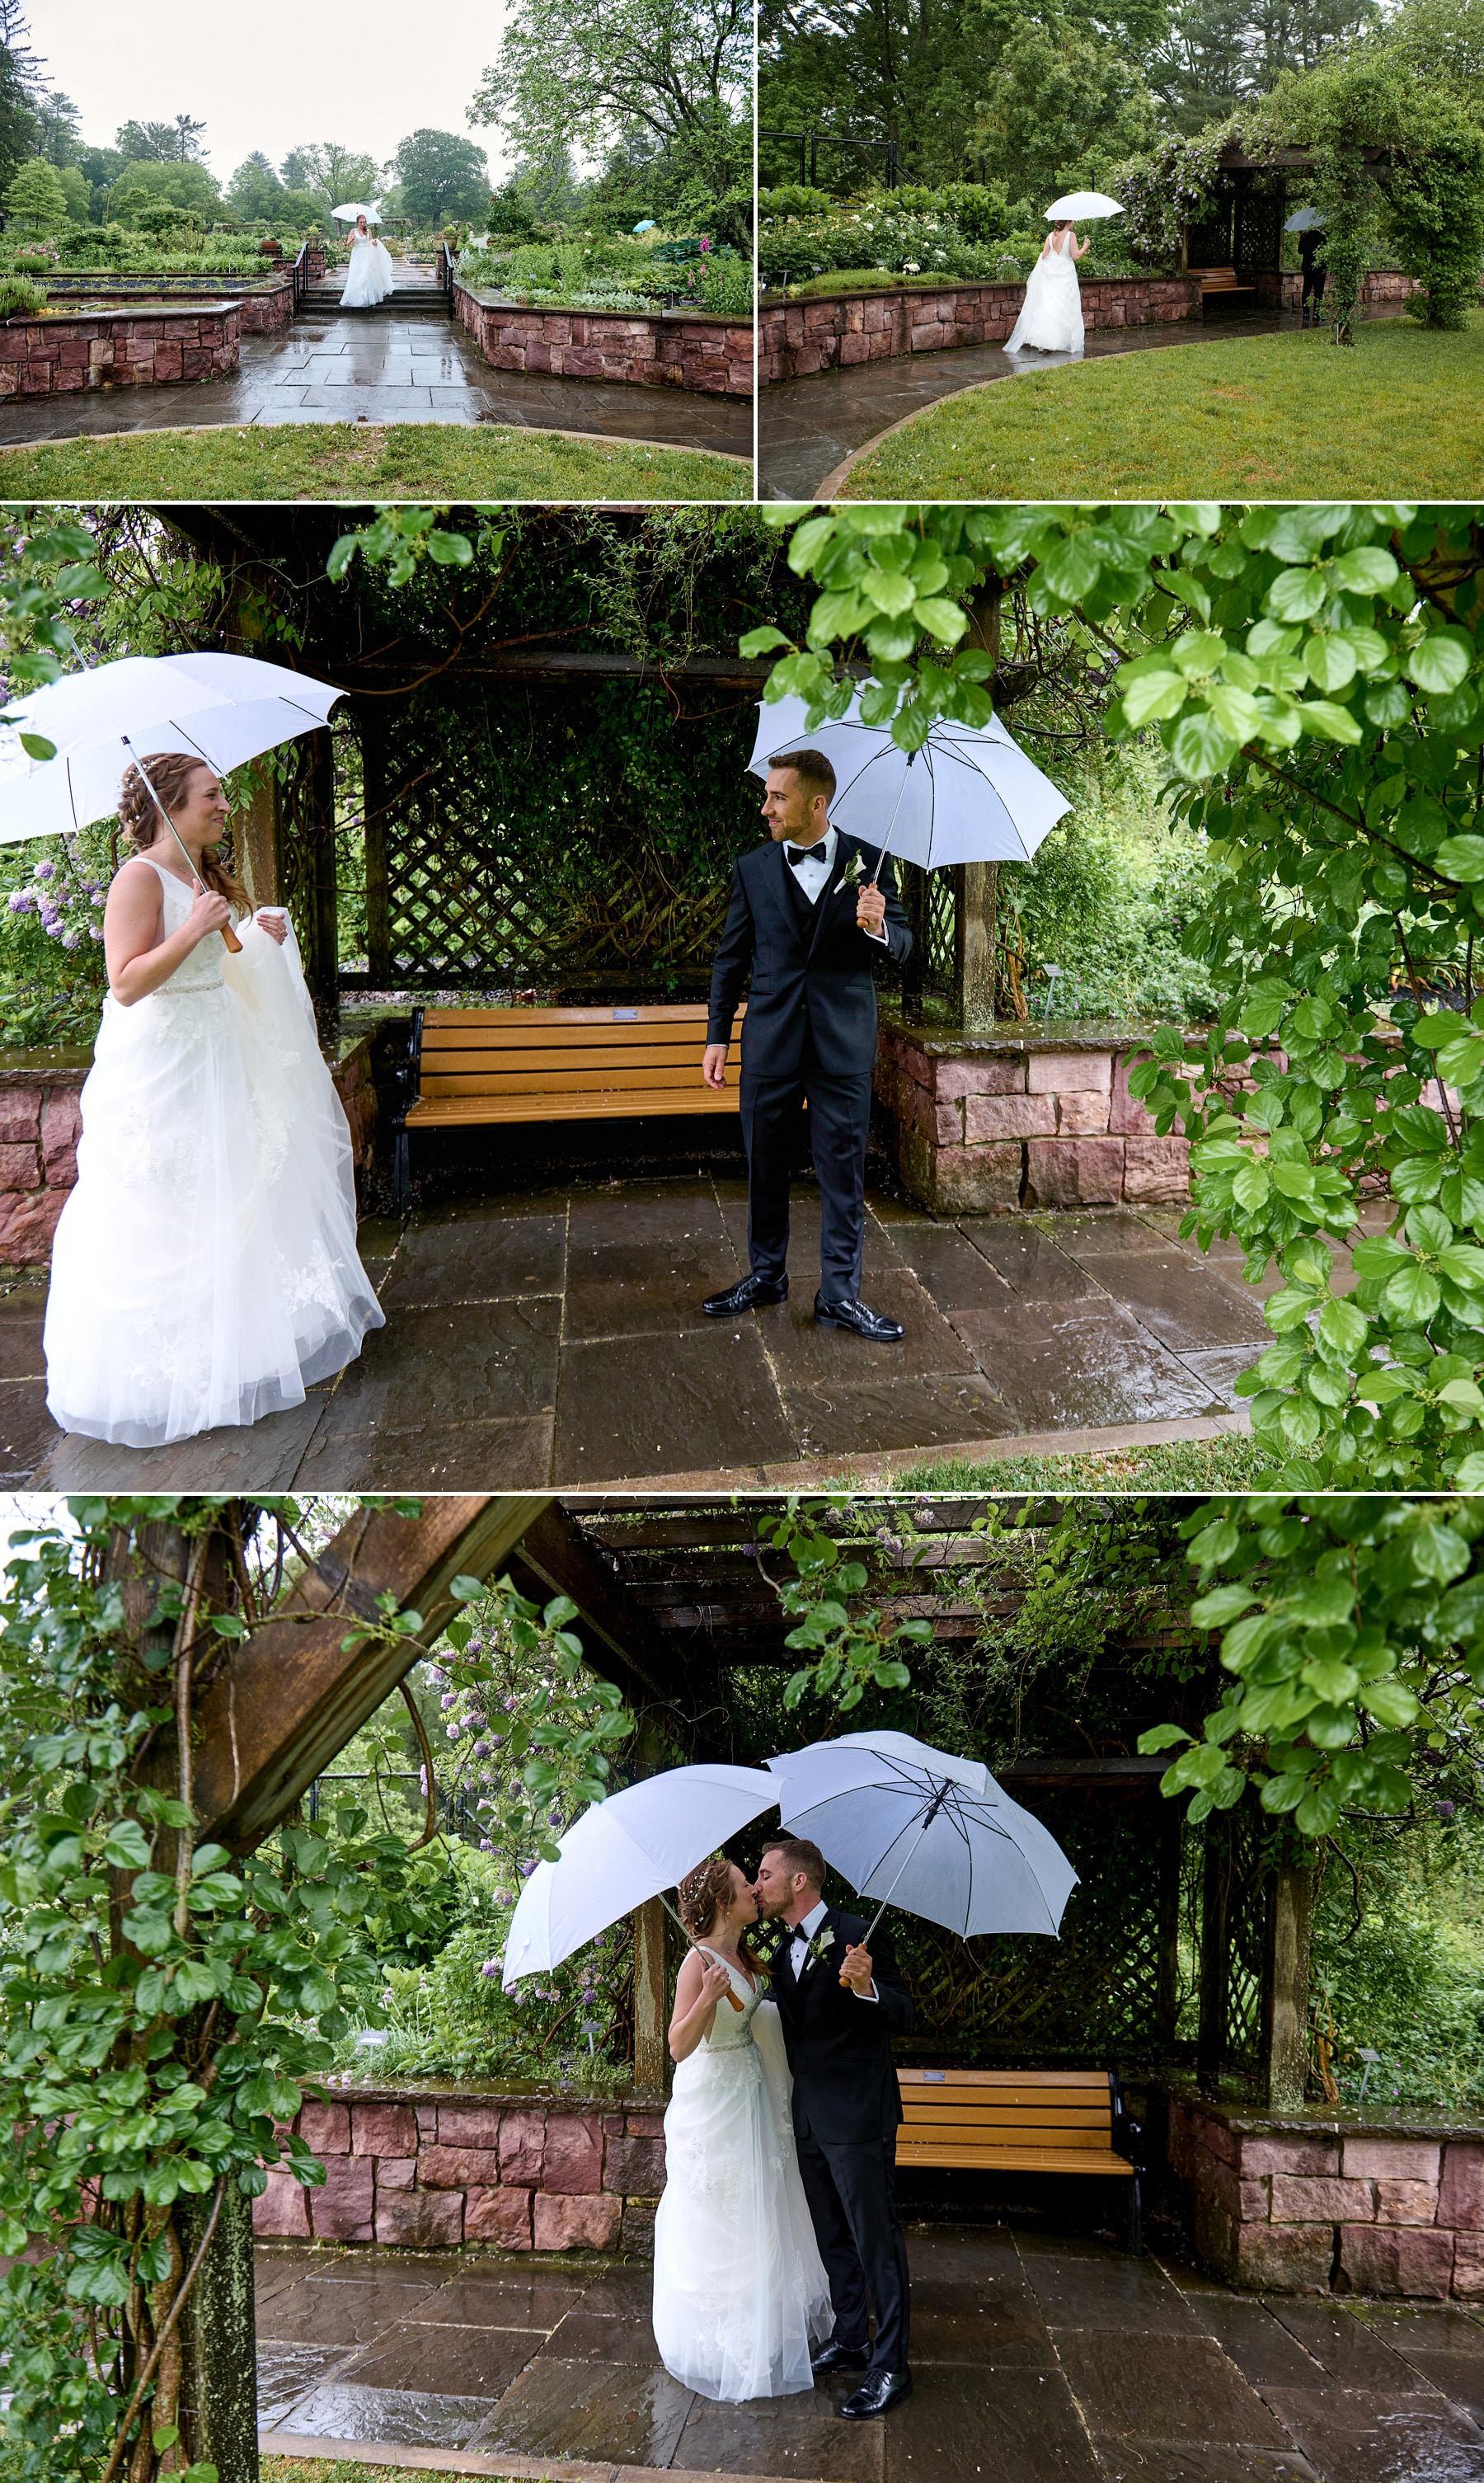 wedding first look in the rain photo